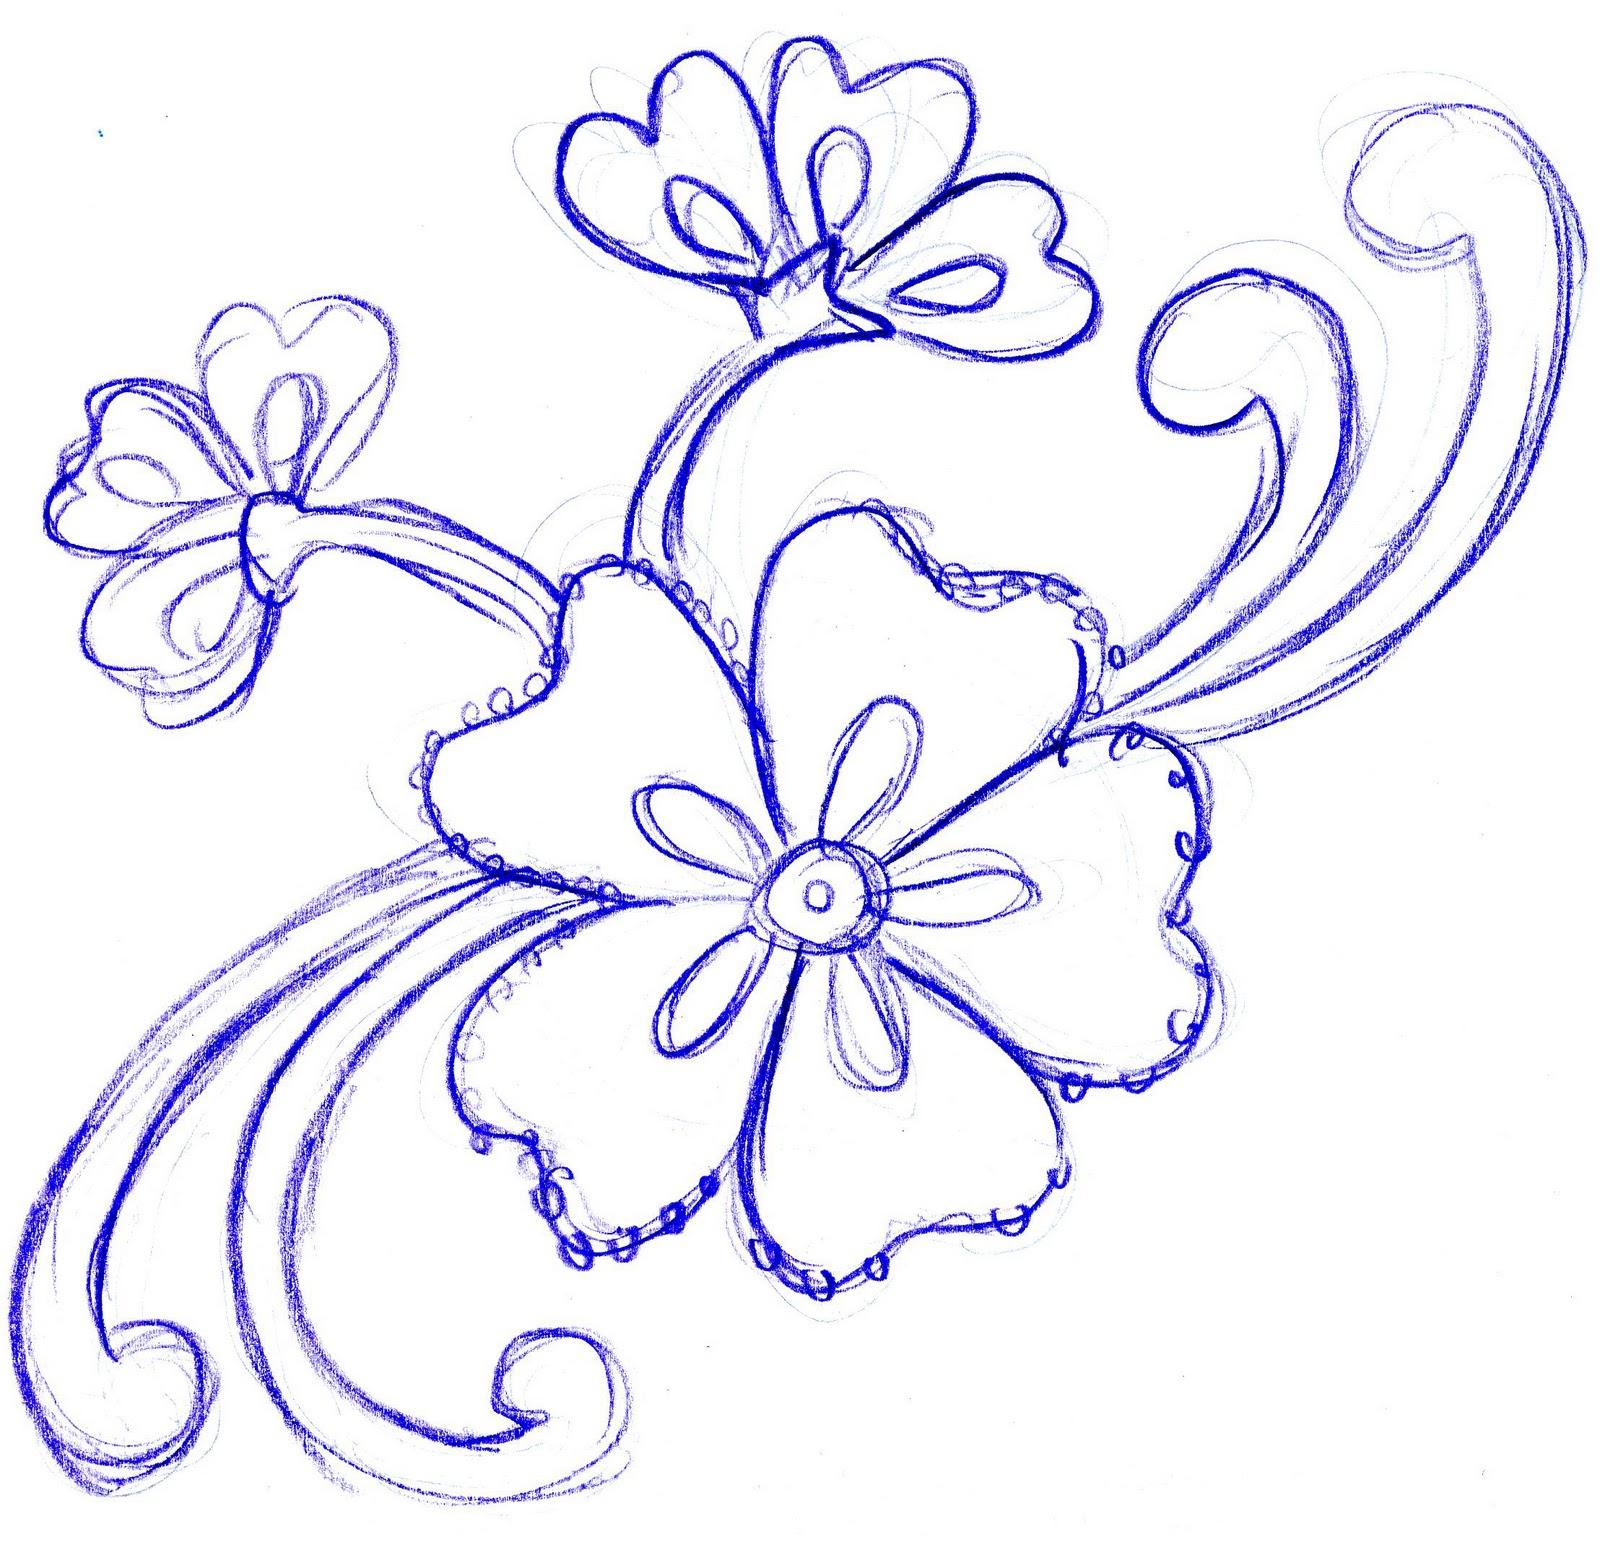 1600x1542 Pencil Sketch Flower Design Pictures Pencil Sketch Design